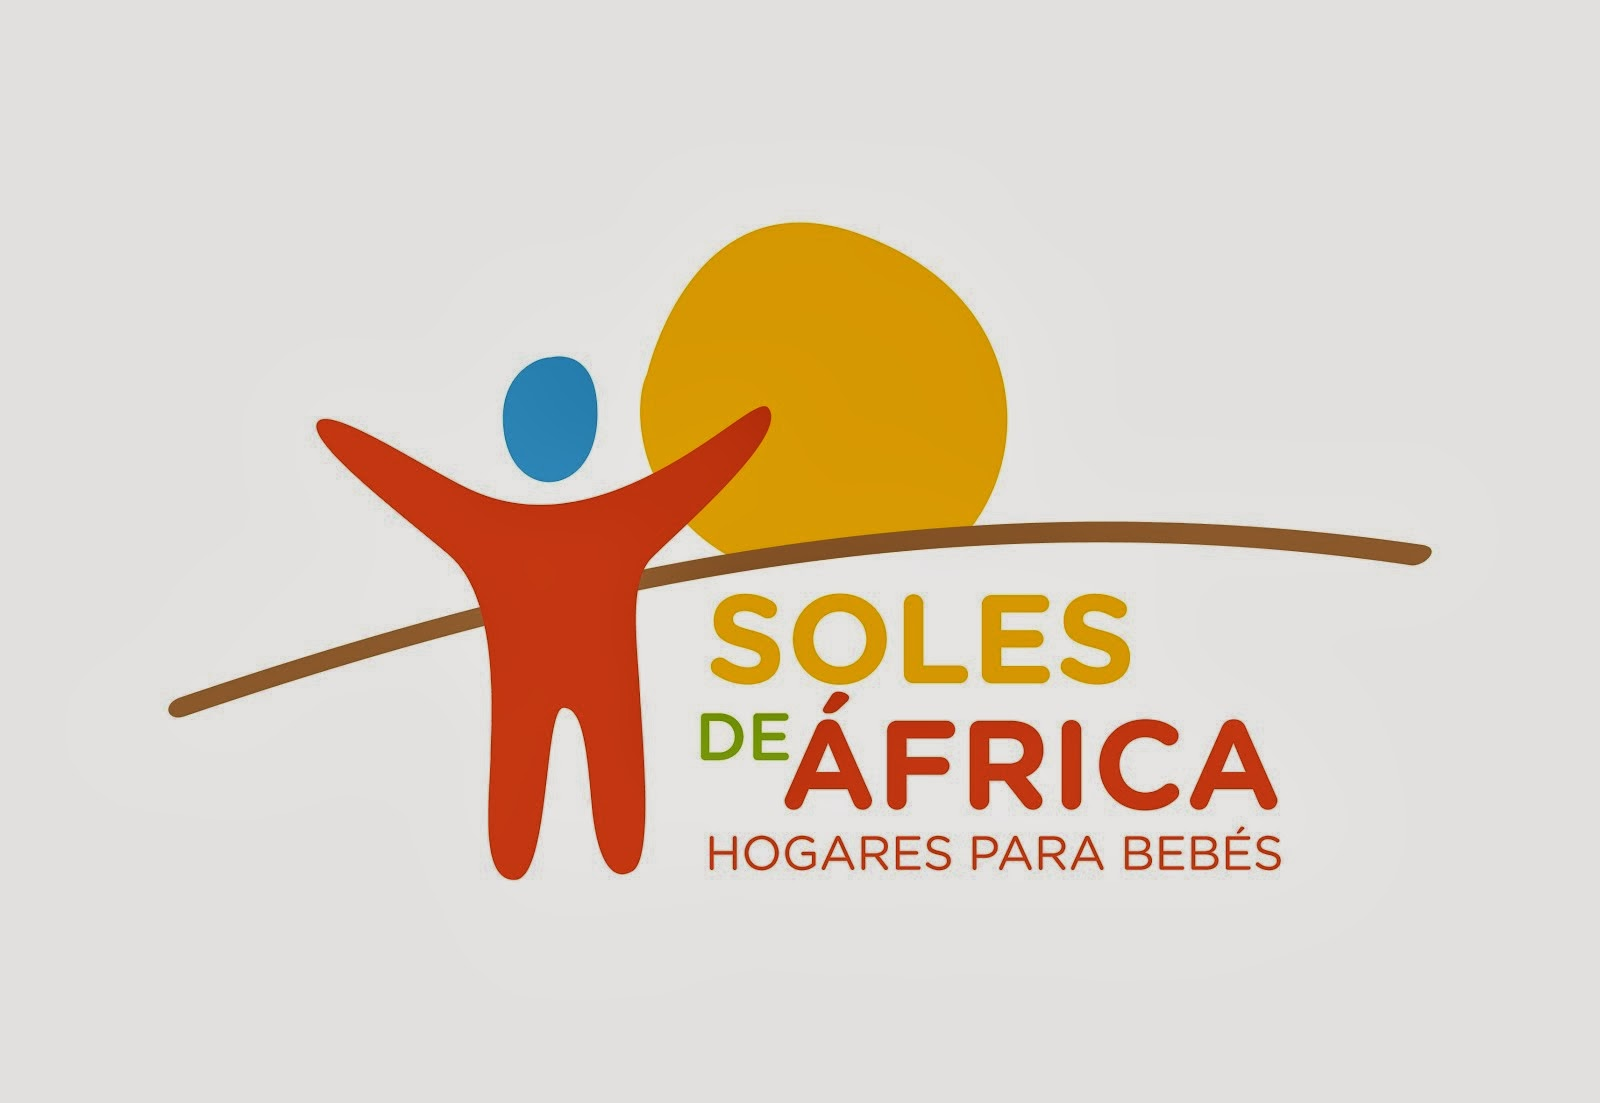 Soles de África